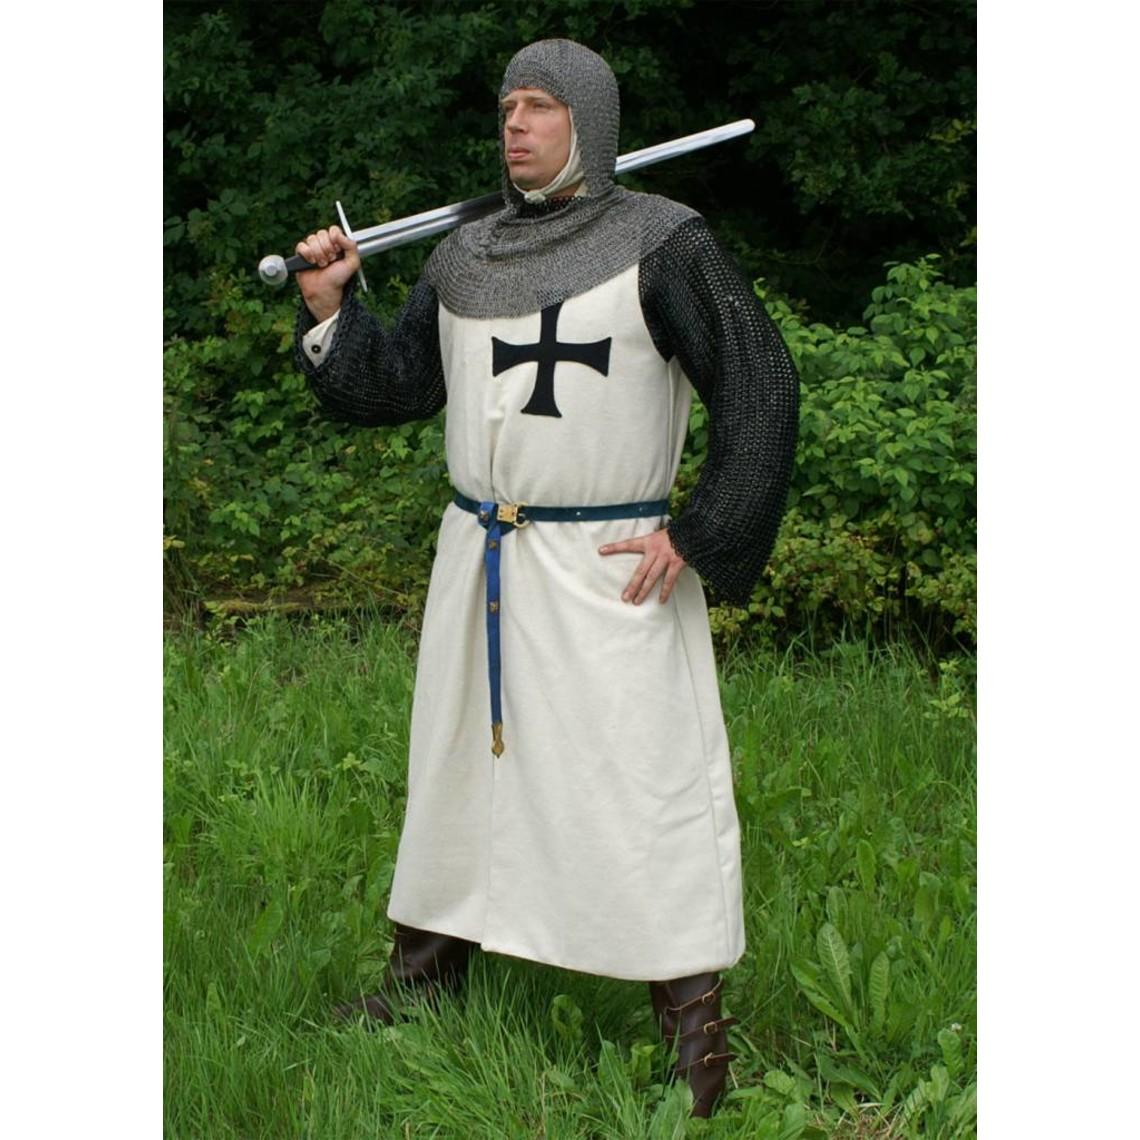 Ulfberth Storico sopravveste teutonico